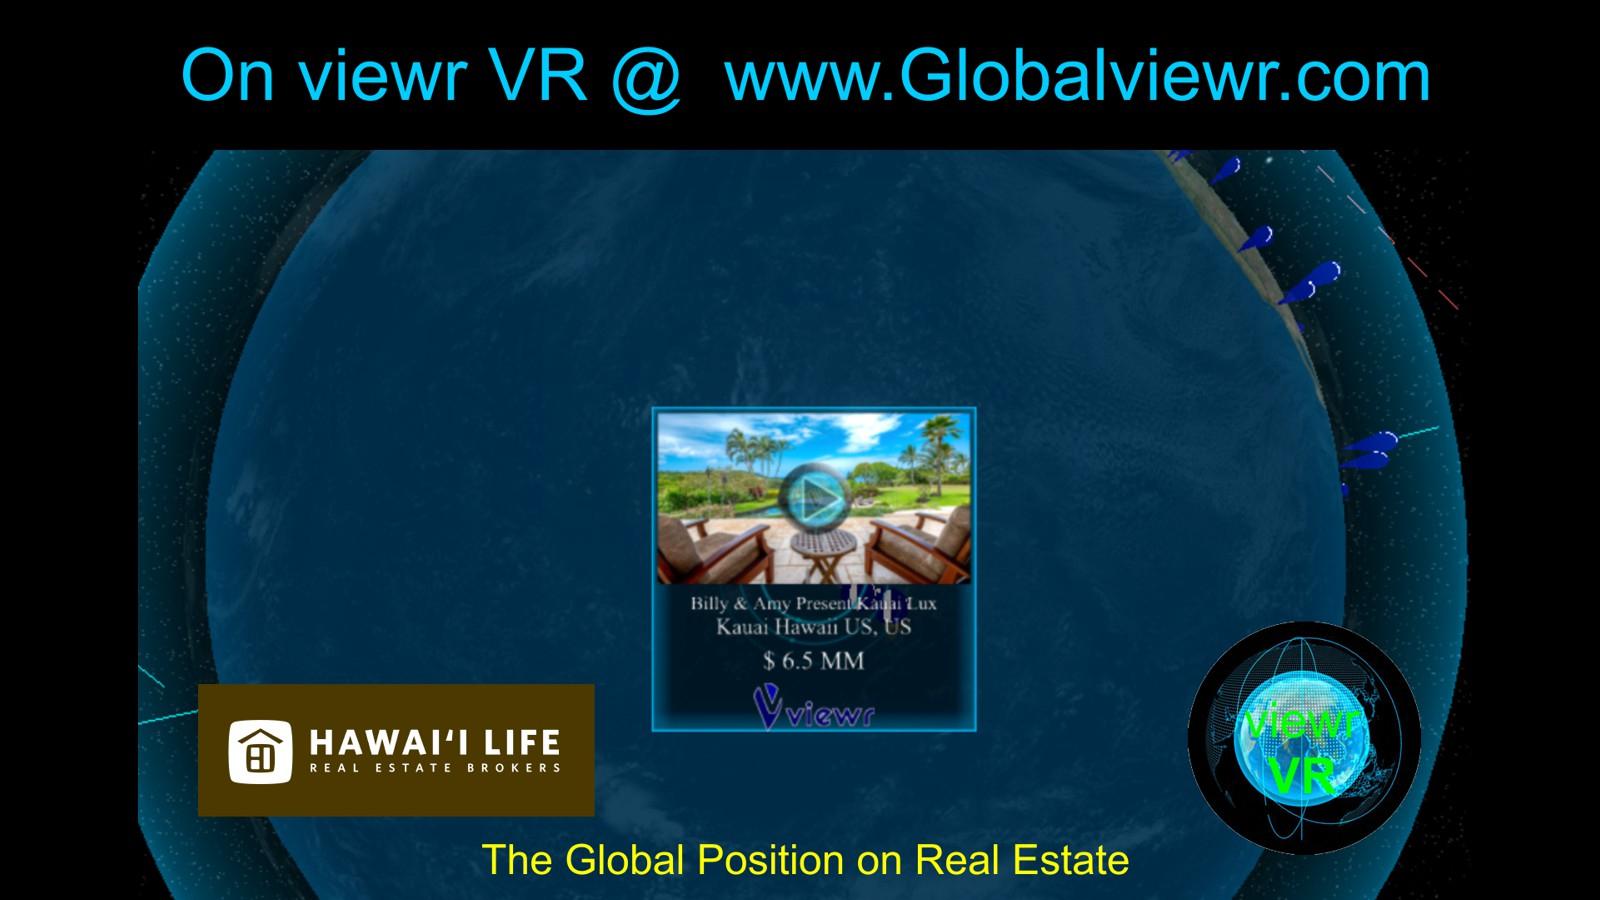 Billy and Amy Kauai Hawaii VR Slide